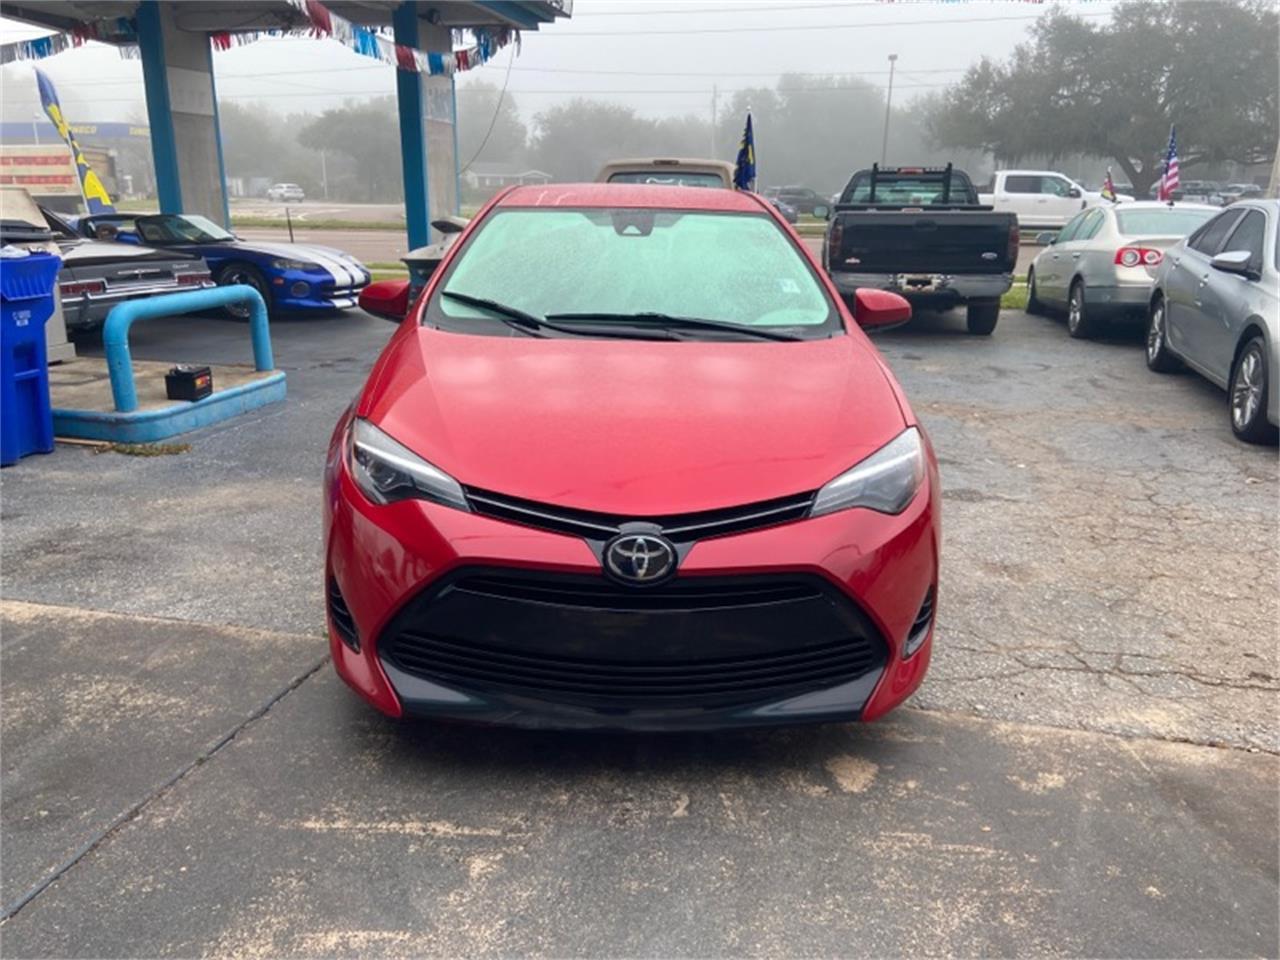 2018 Toyota Corolla (CC-1313546) for sale in Tavares, Florida